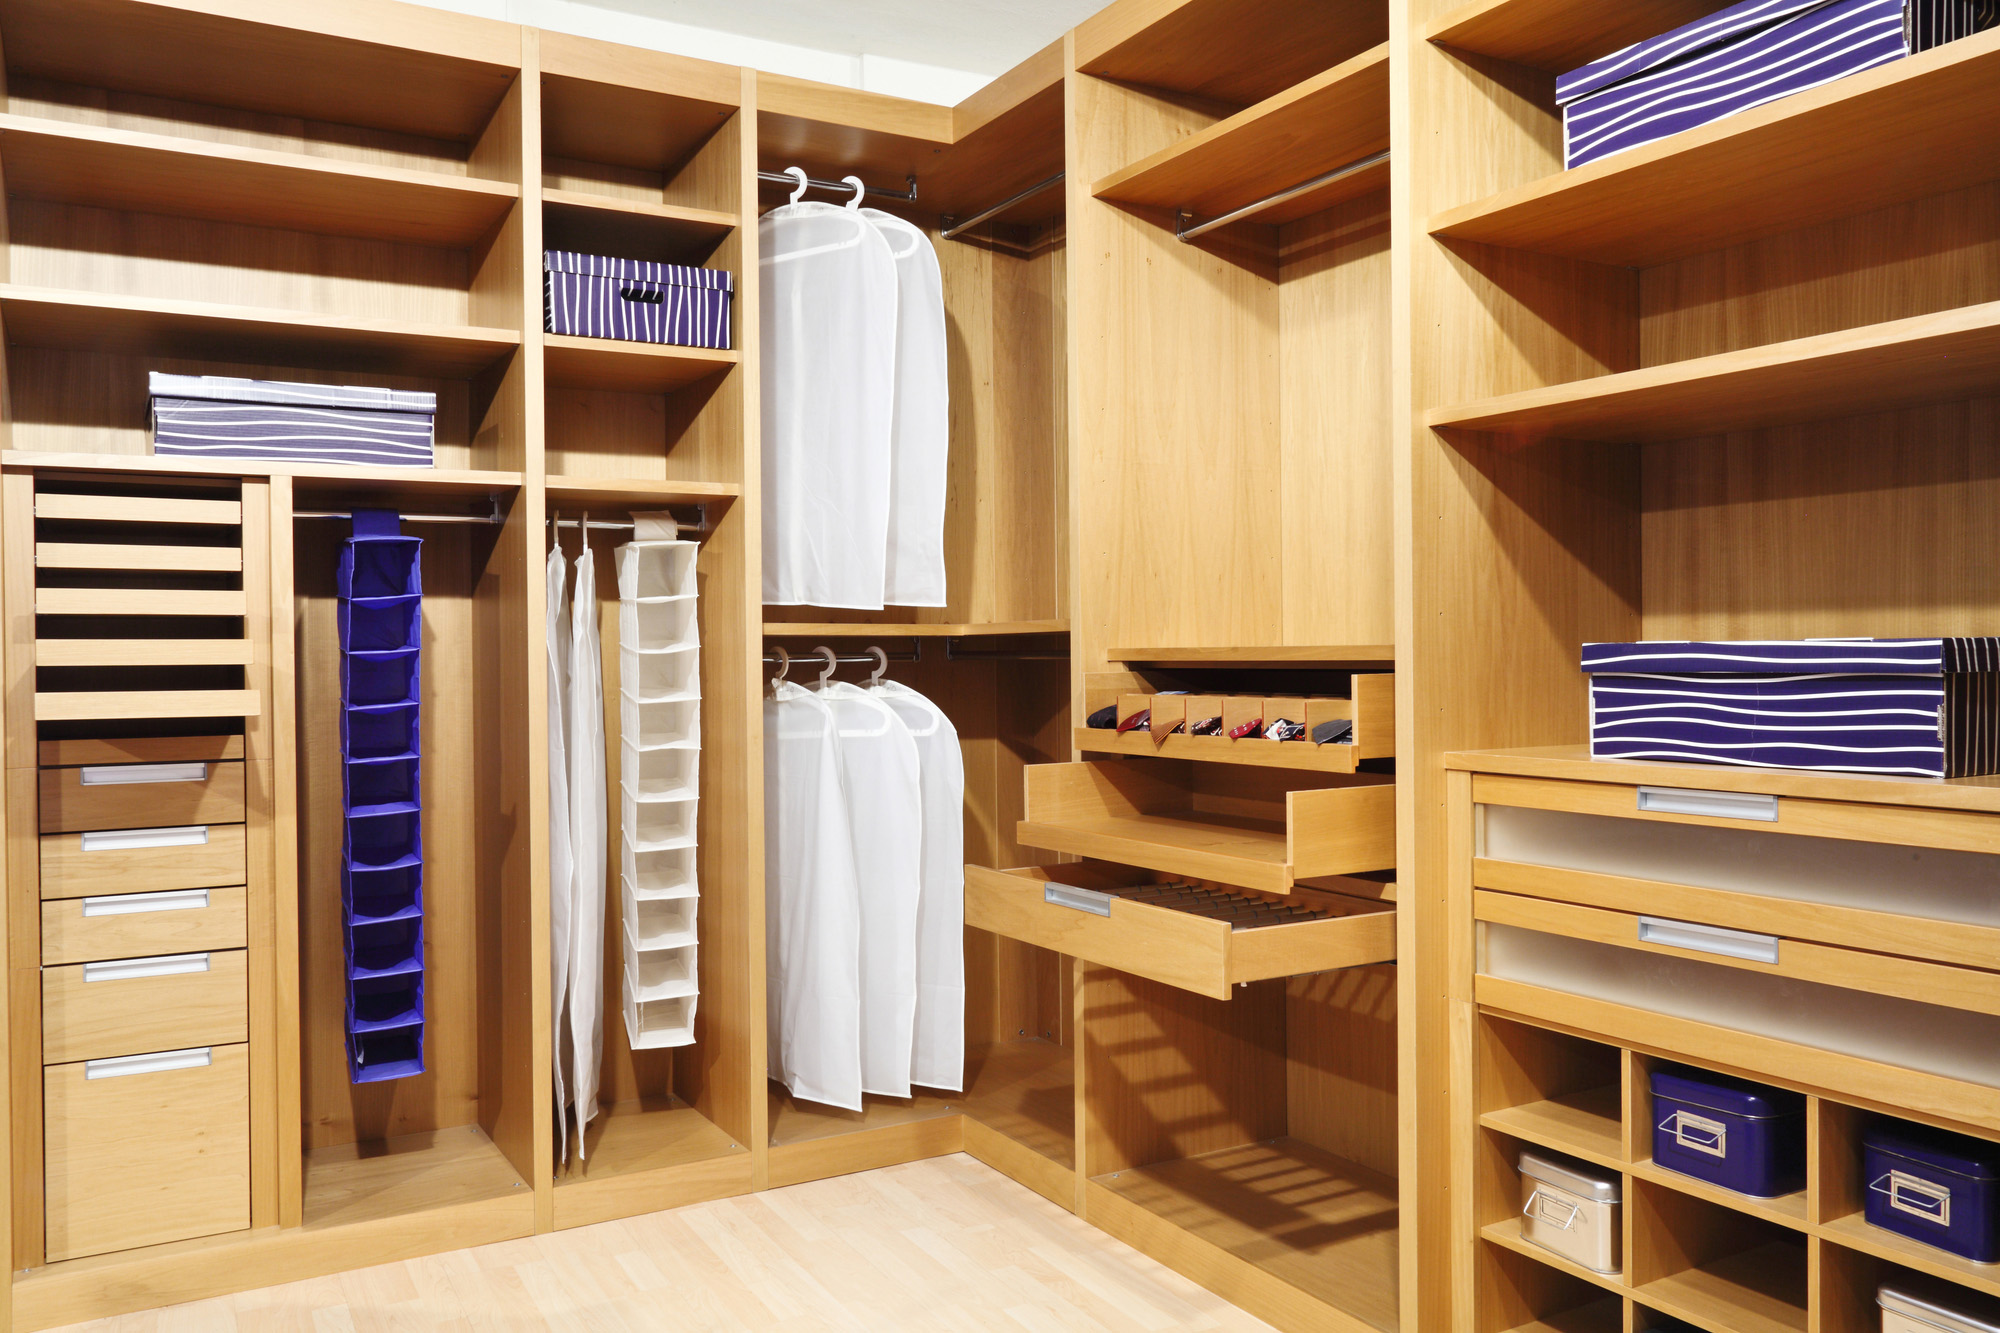 walk in wardrobe, trouser rail, shoe storage, built in wardrobes